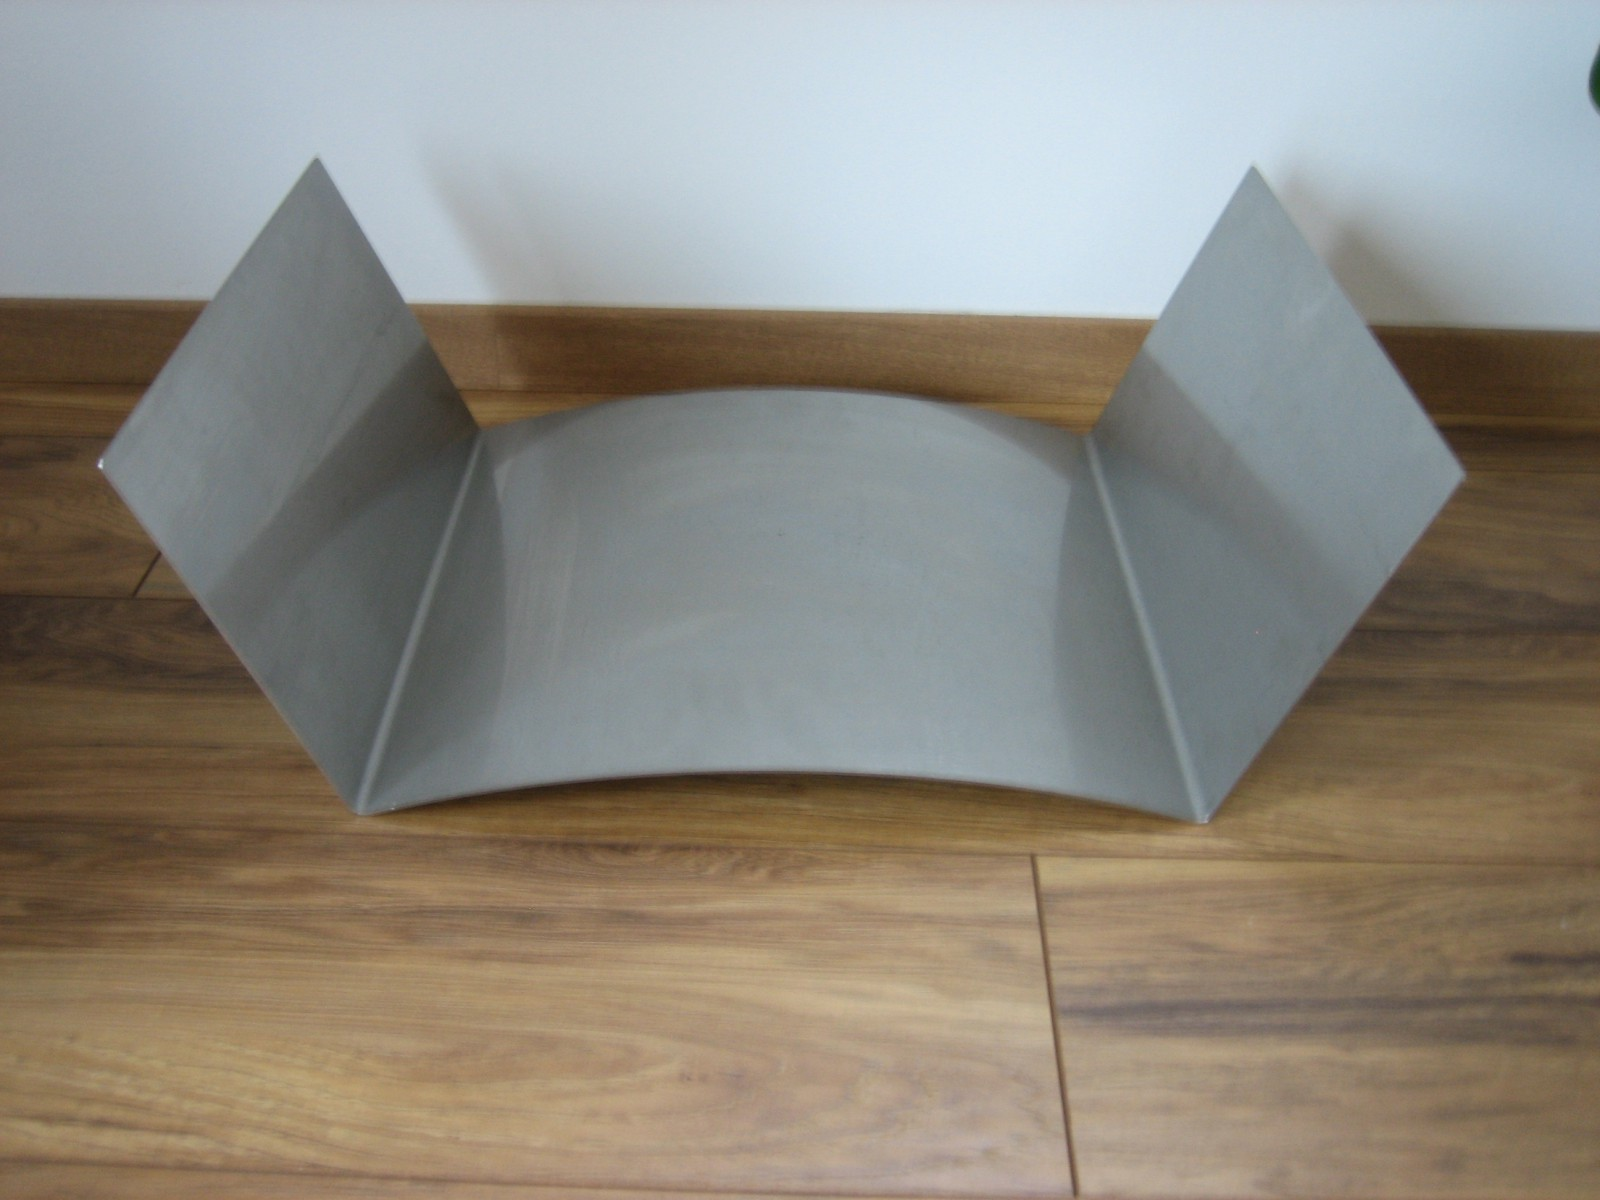 edelstahl holzablage holzlege kaminholzablage kaminzubeh r. Black Bedroom Furniture Sets. Home Design Ideas